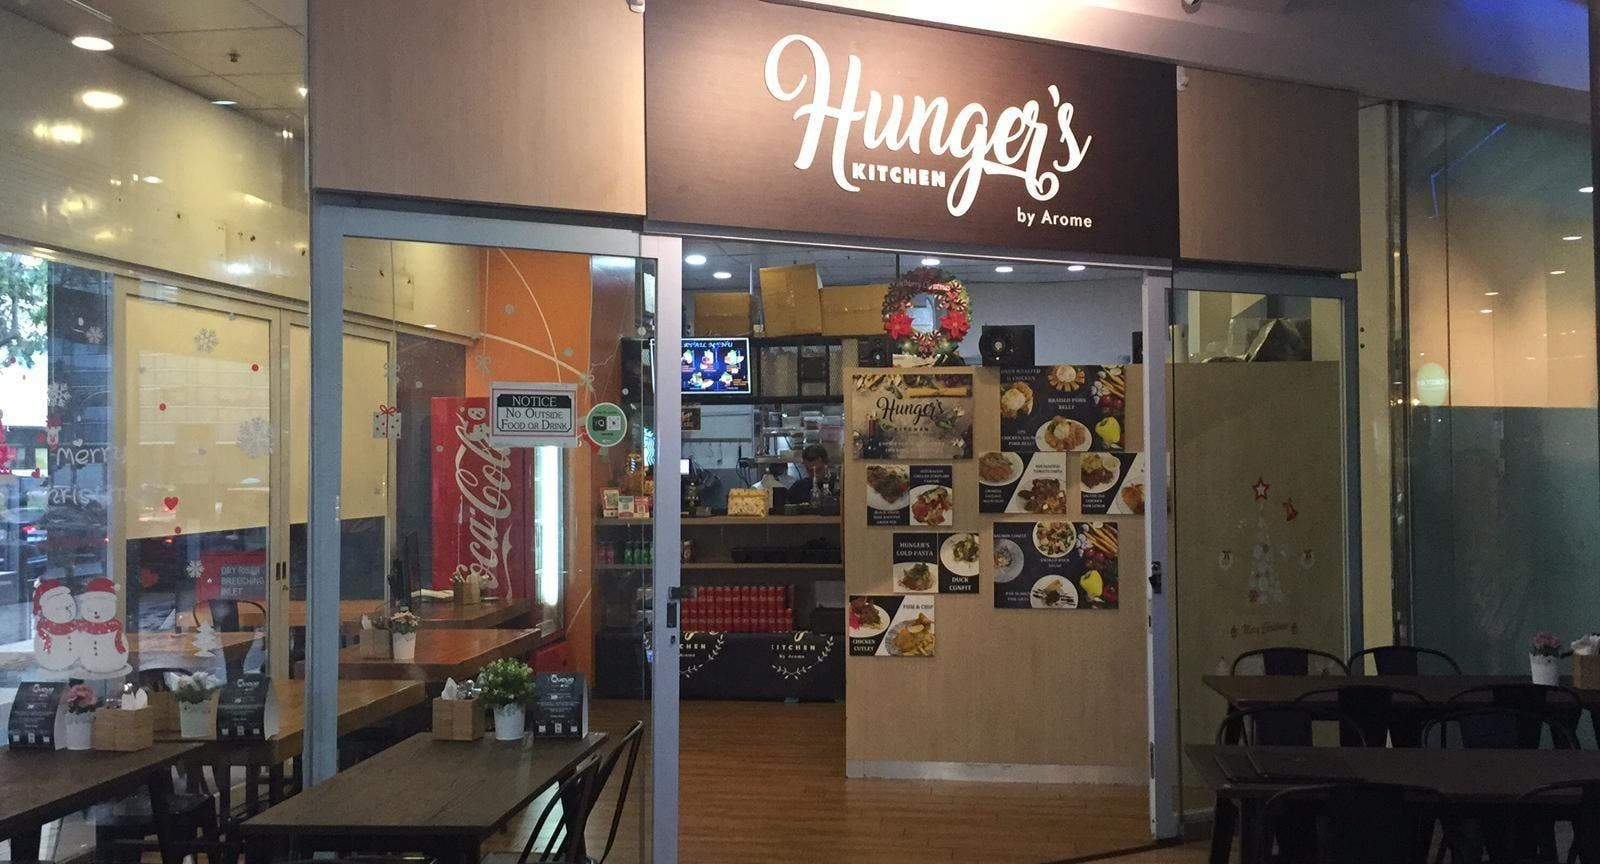 Hunger's Kitchen Singapore image 3